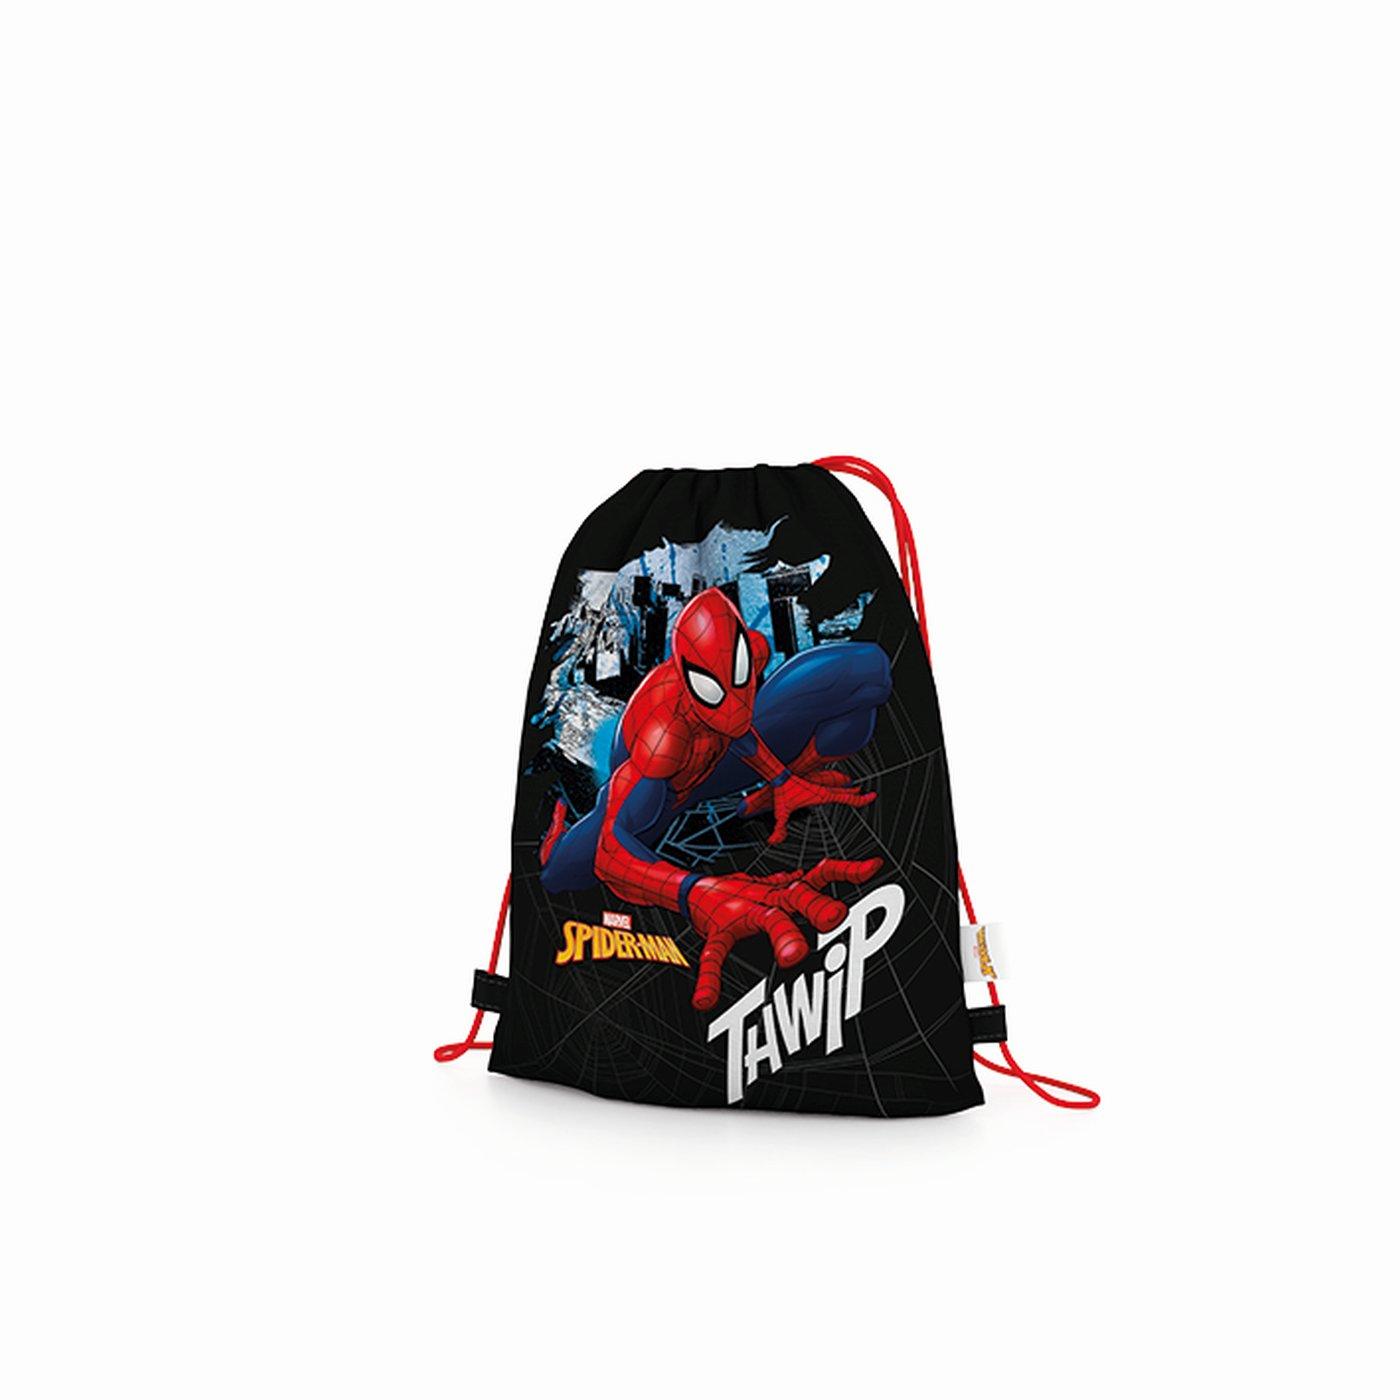 1f260f35433 ... Sáček na cvičky Spiderman The Walt Disney Company Licensing (Spiderman)  · Image